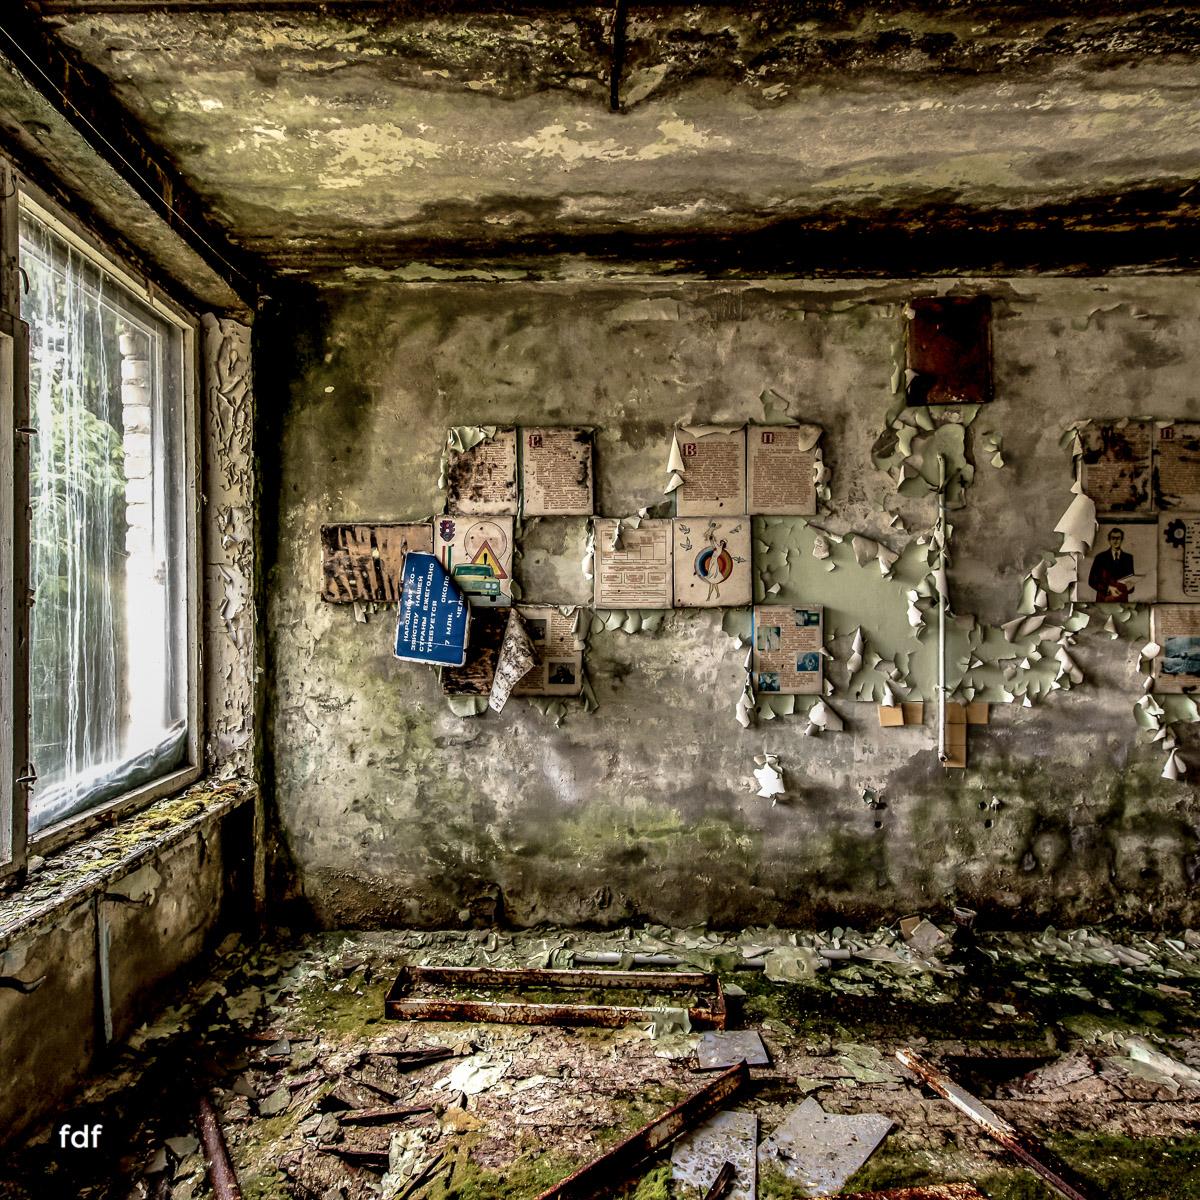 Tschernobyl-Chernobyl-Prypjat-Urbex-Lost-Place-Duga-Schule-Kino-12.jpg